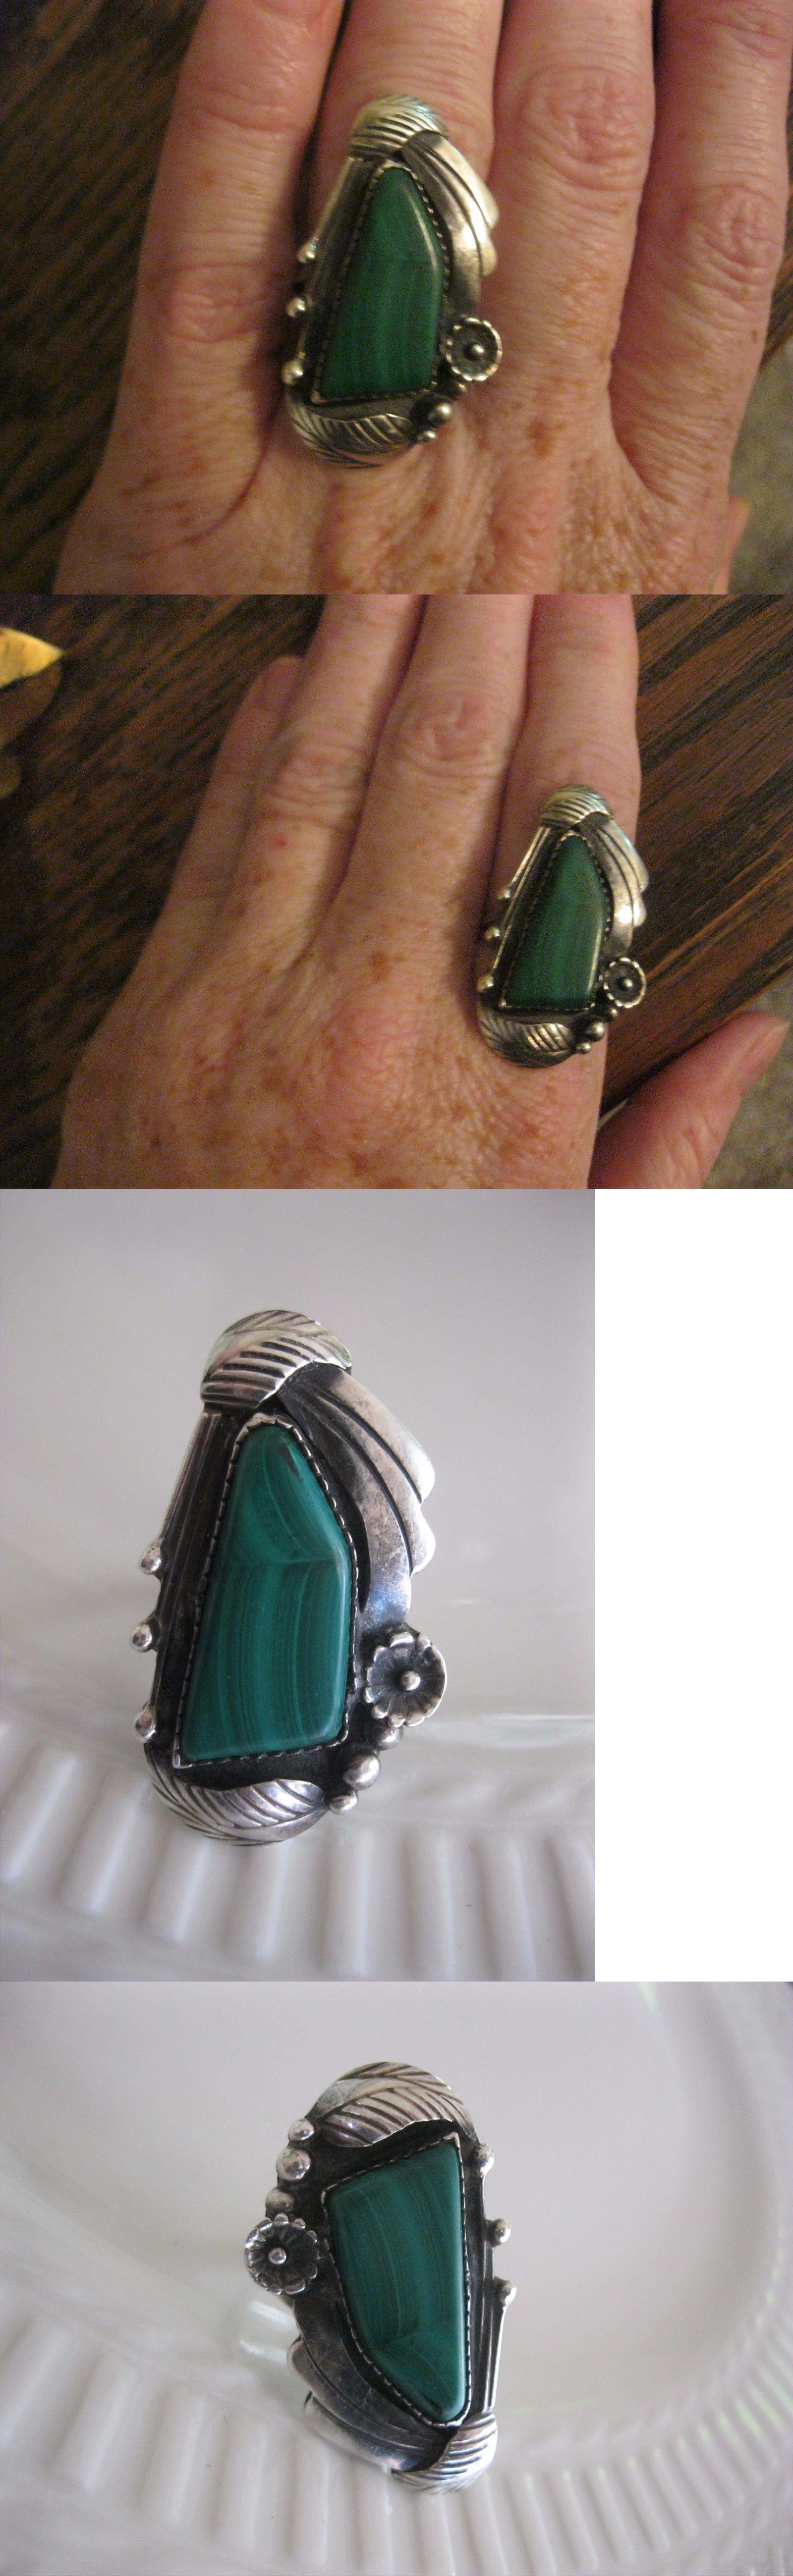 Rings 98500: Vtg Estate Huge Dead Old Pawn Ring Navajo Sterling R. Dawes Squash Blossom Rare -> BUY IT NOW ONLY: $165 on eBay!